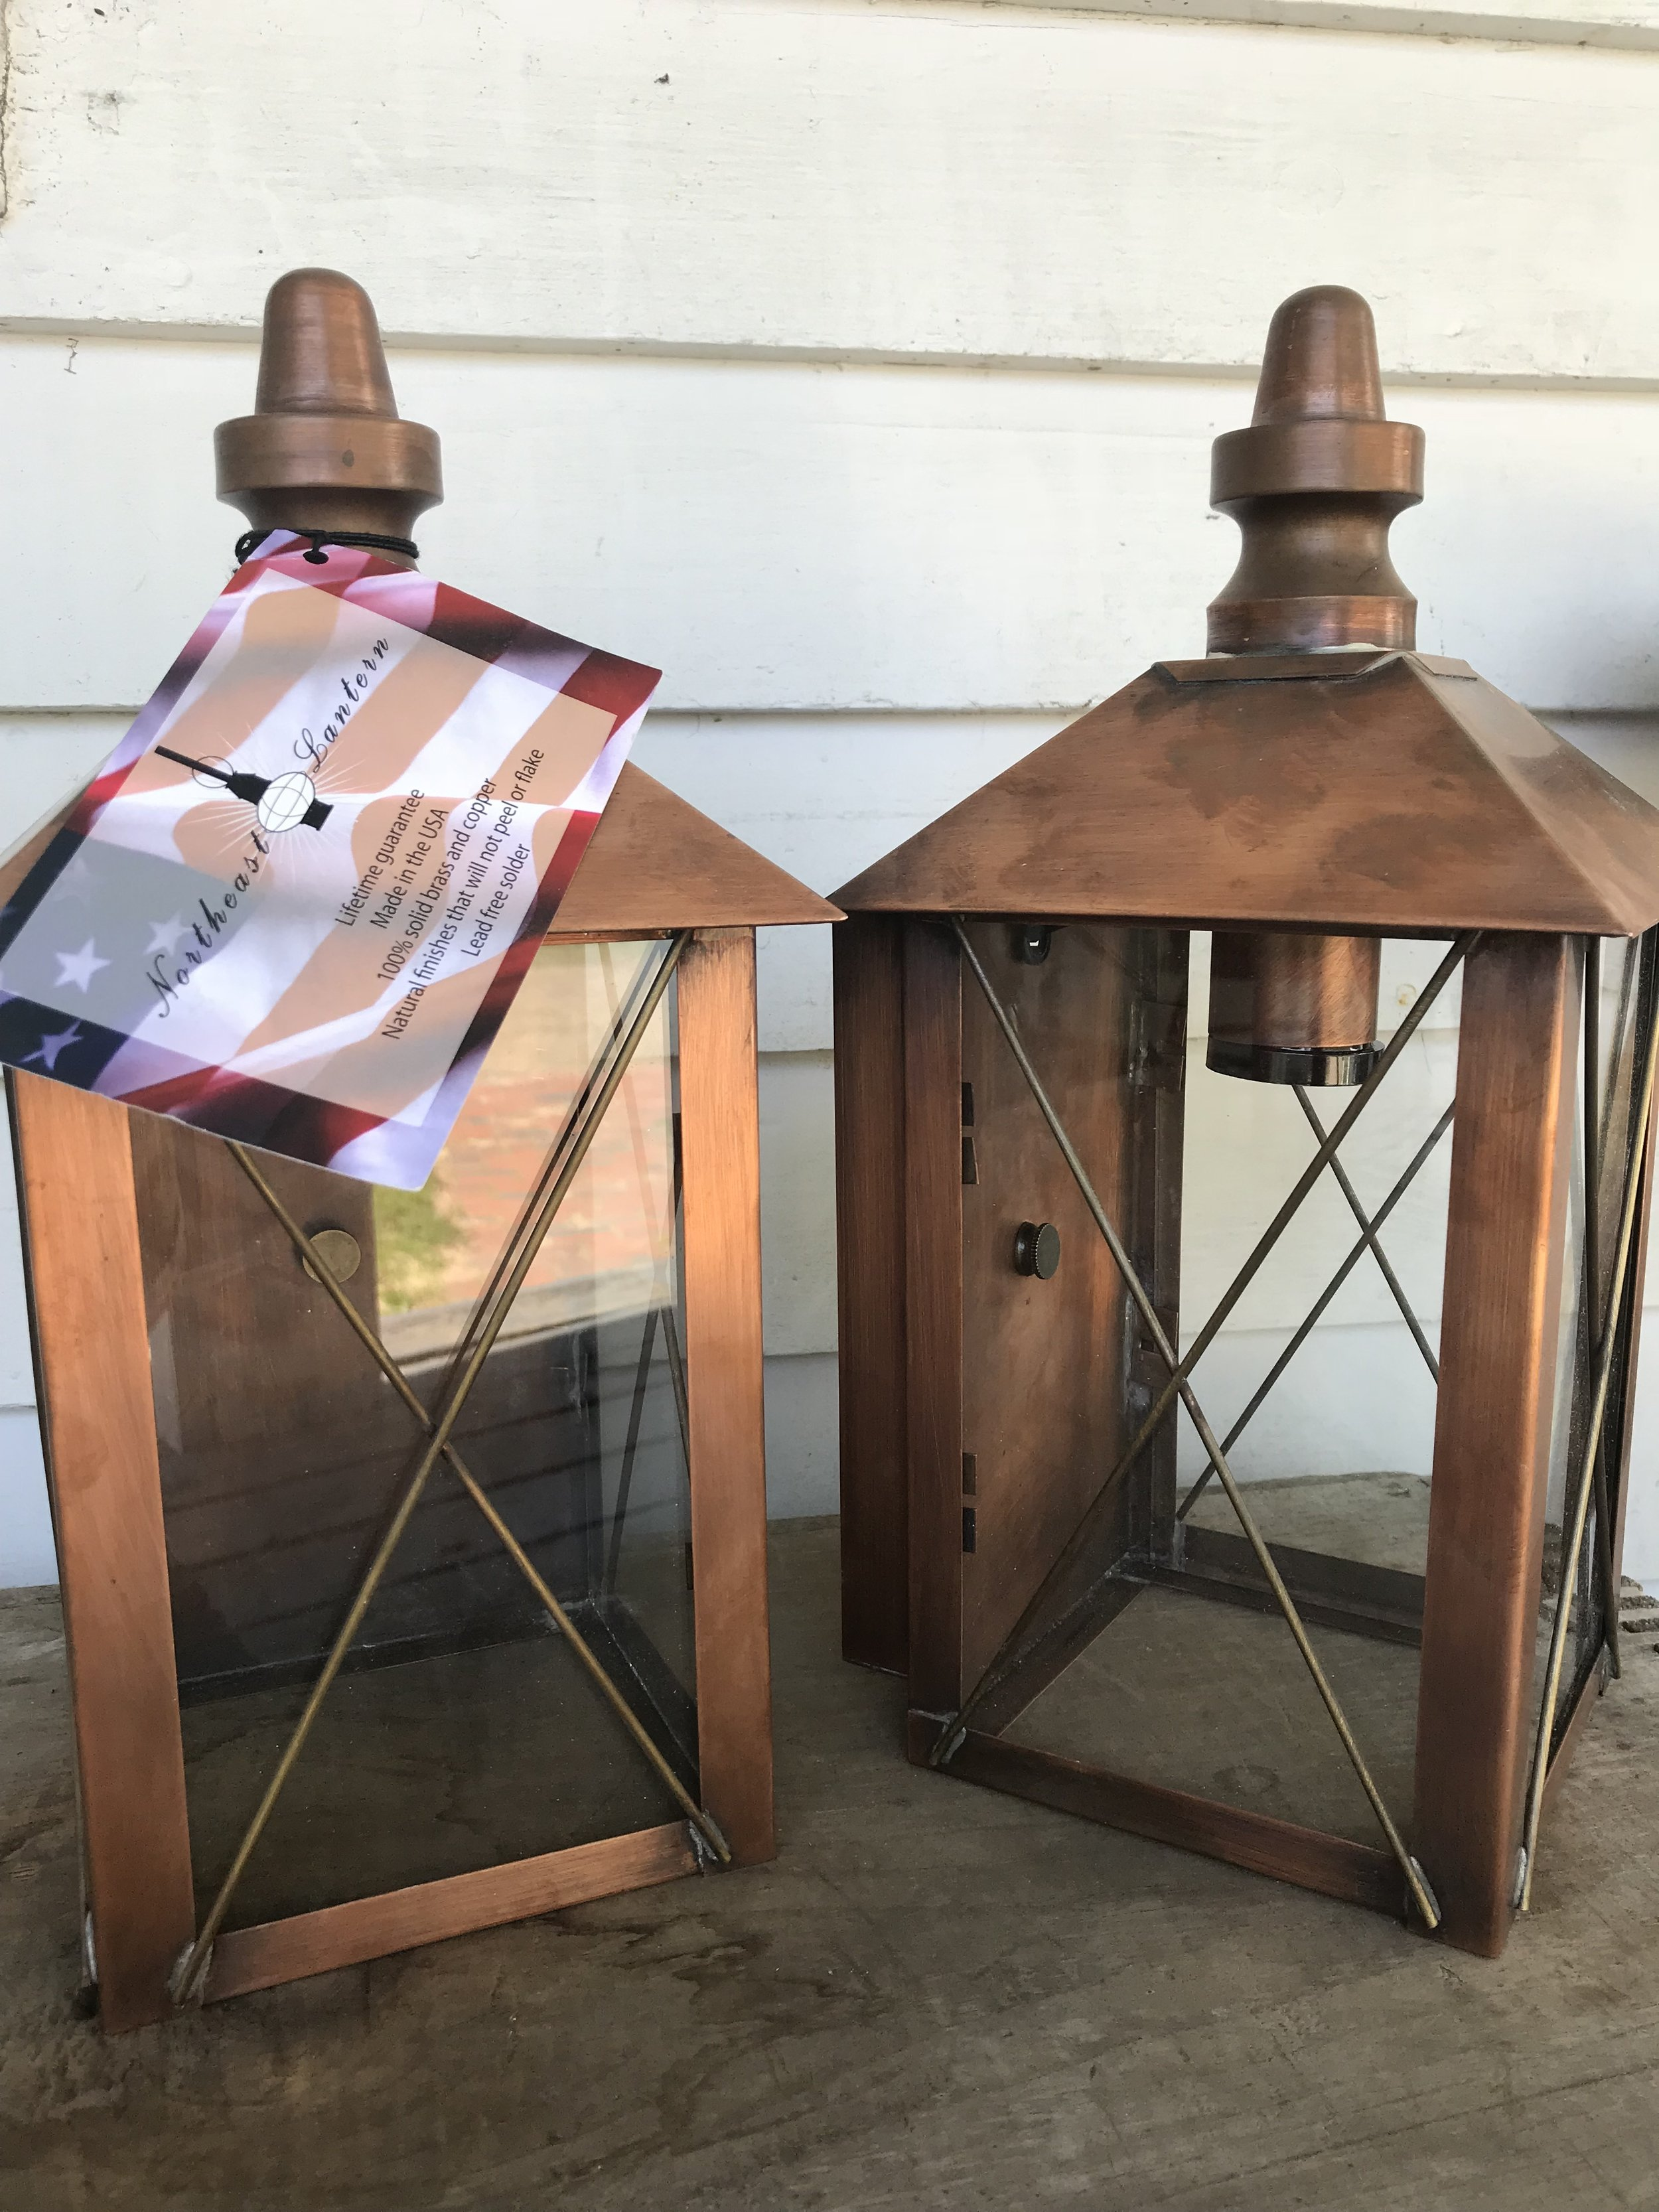 2 Lanterns - A set of two lanterns from Northeast Lantern.$200 value